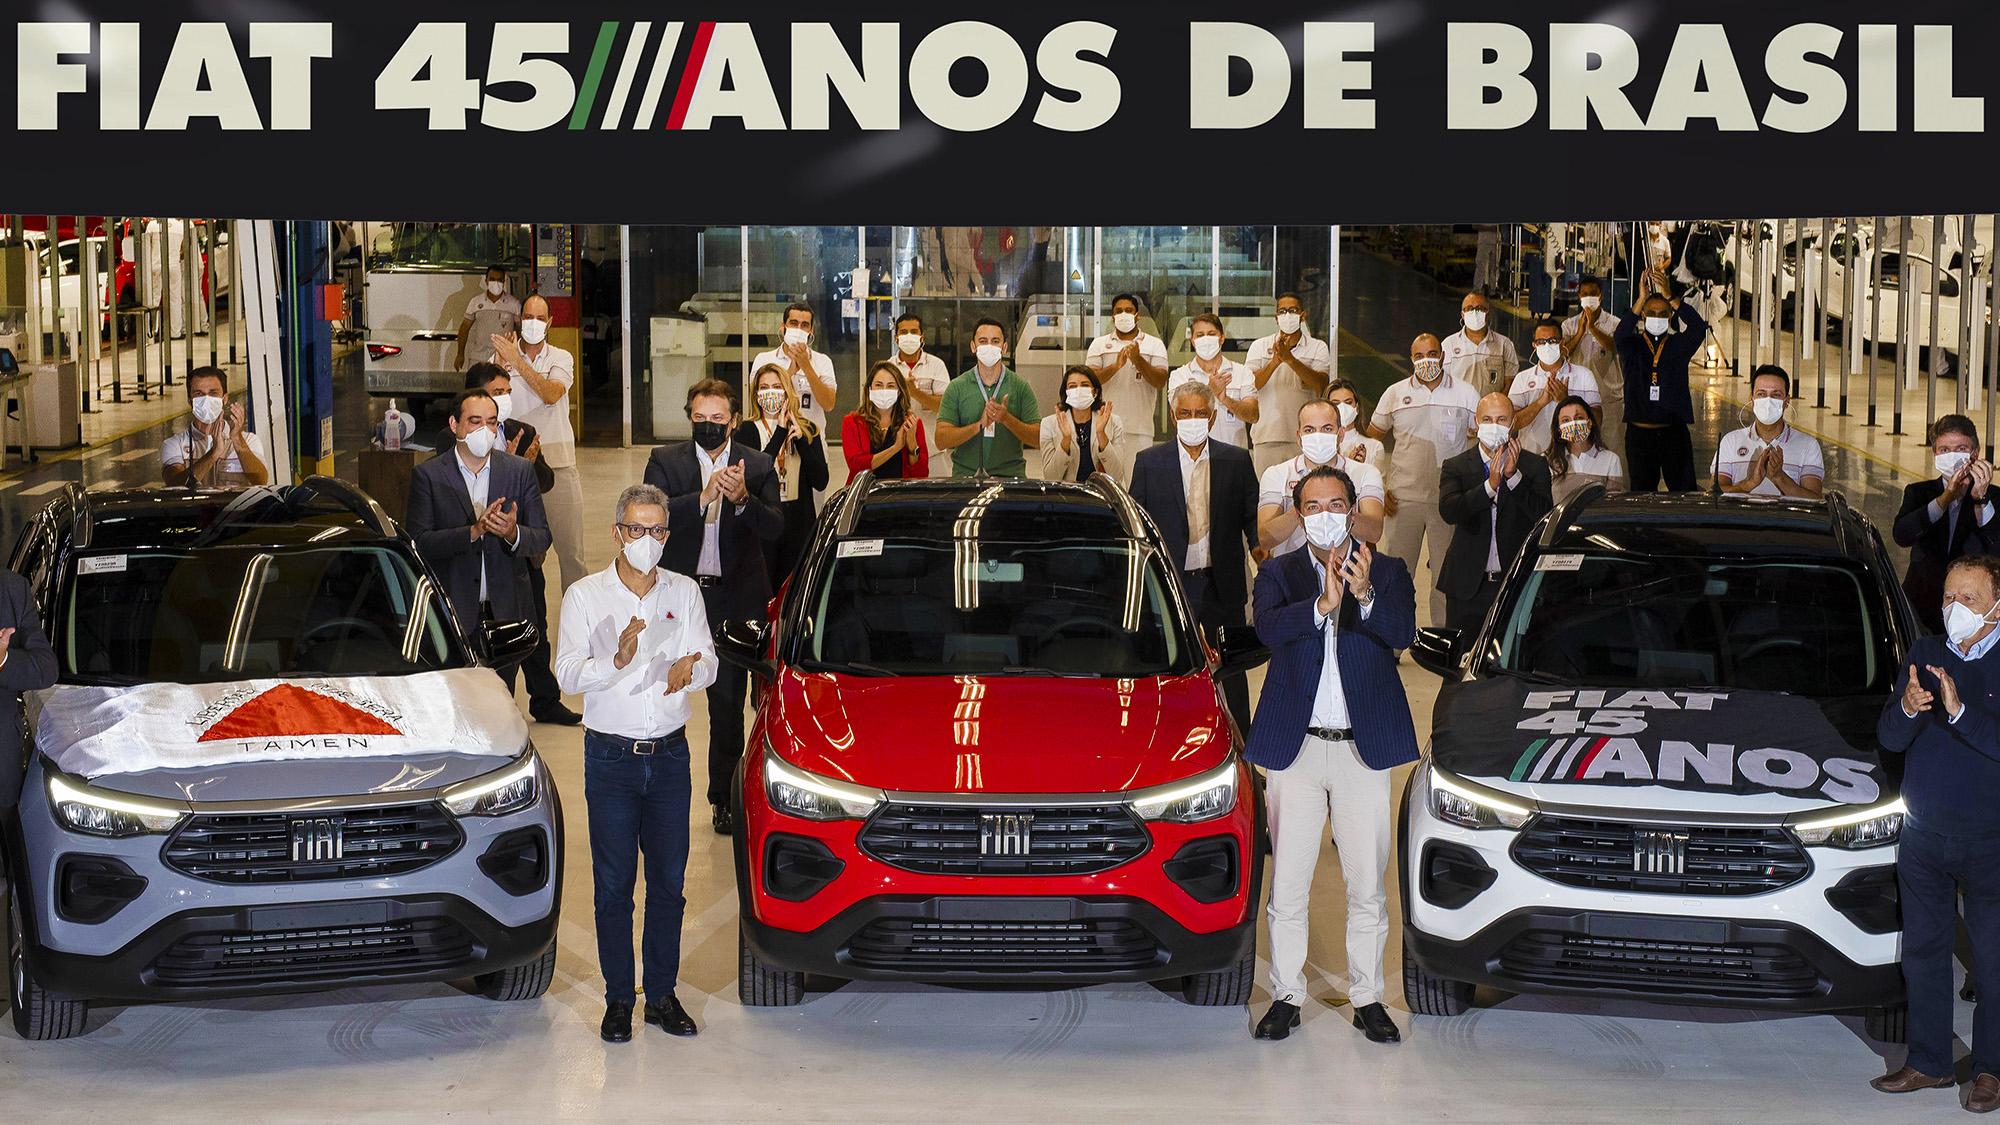 20210709 - BETIM-MG - FIAT 45 ANOS - Foto